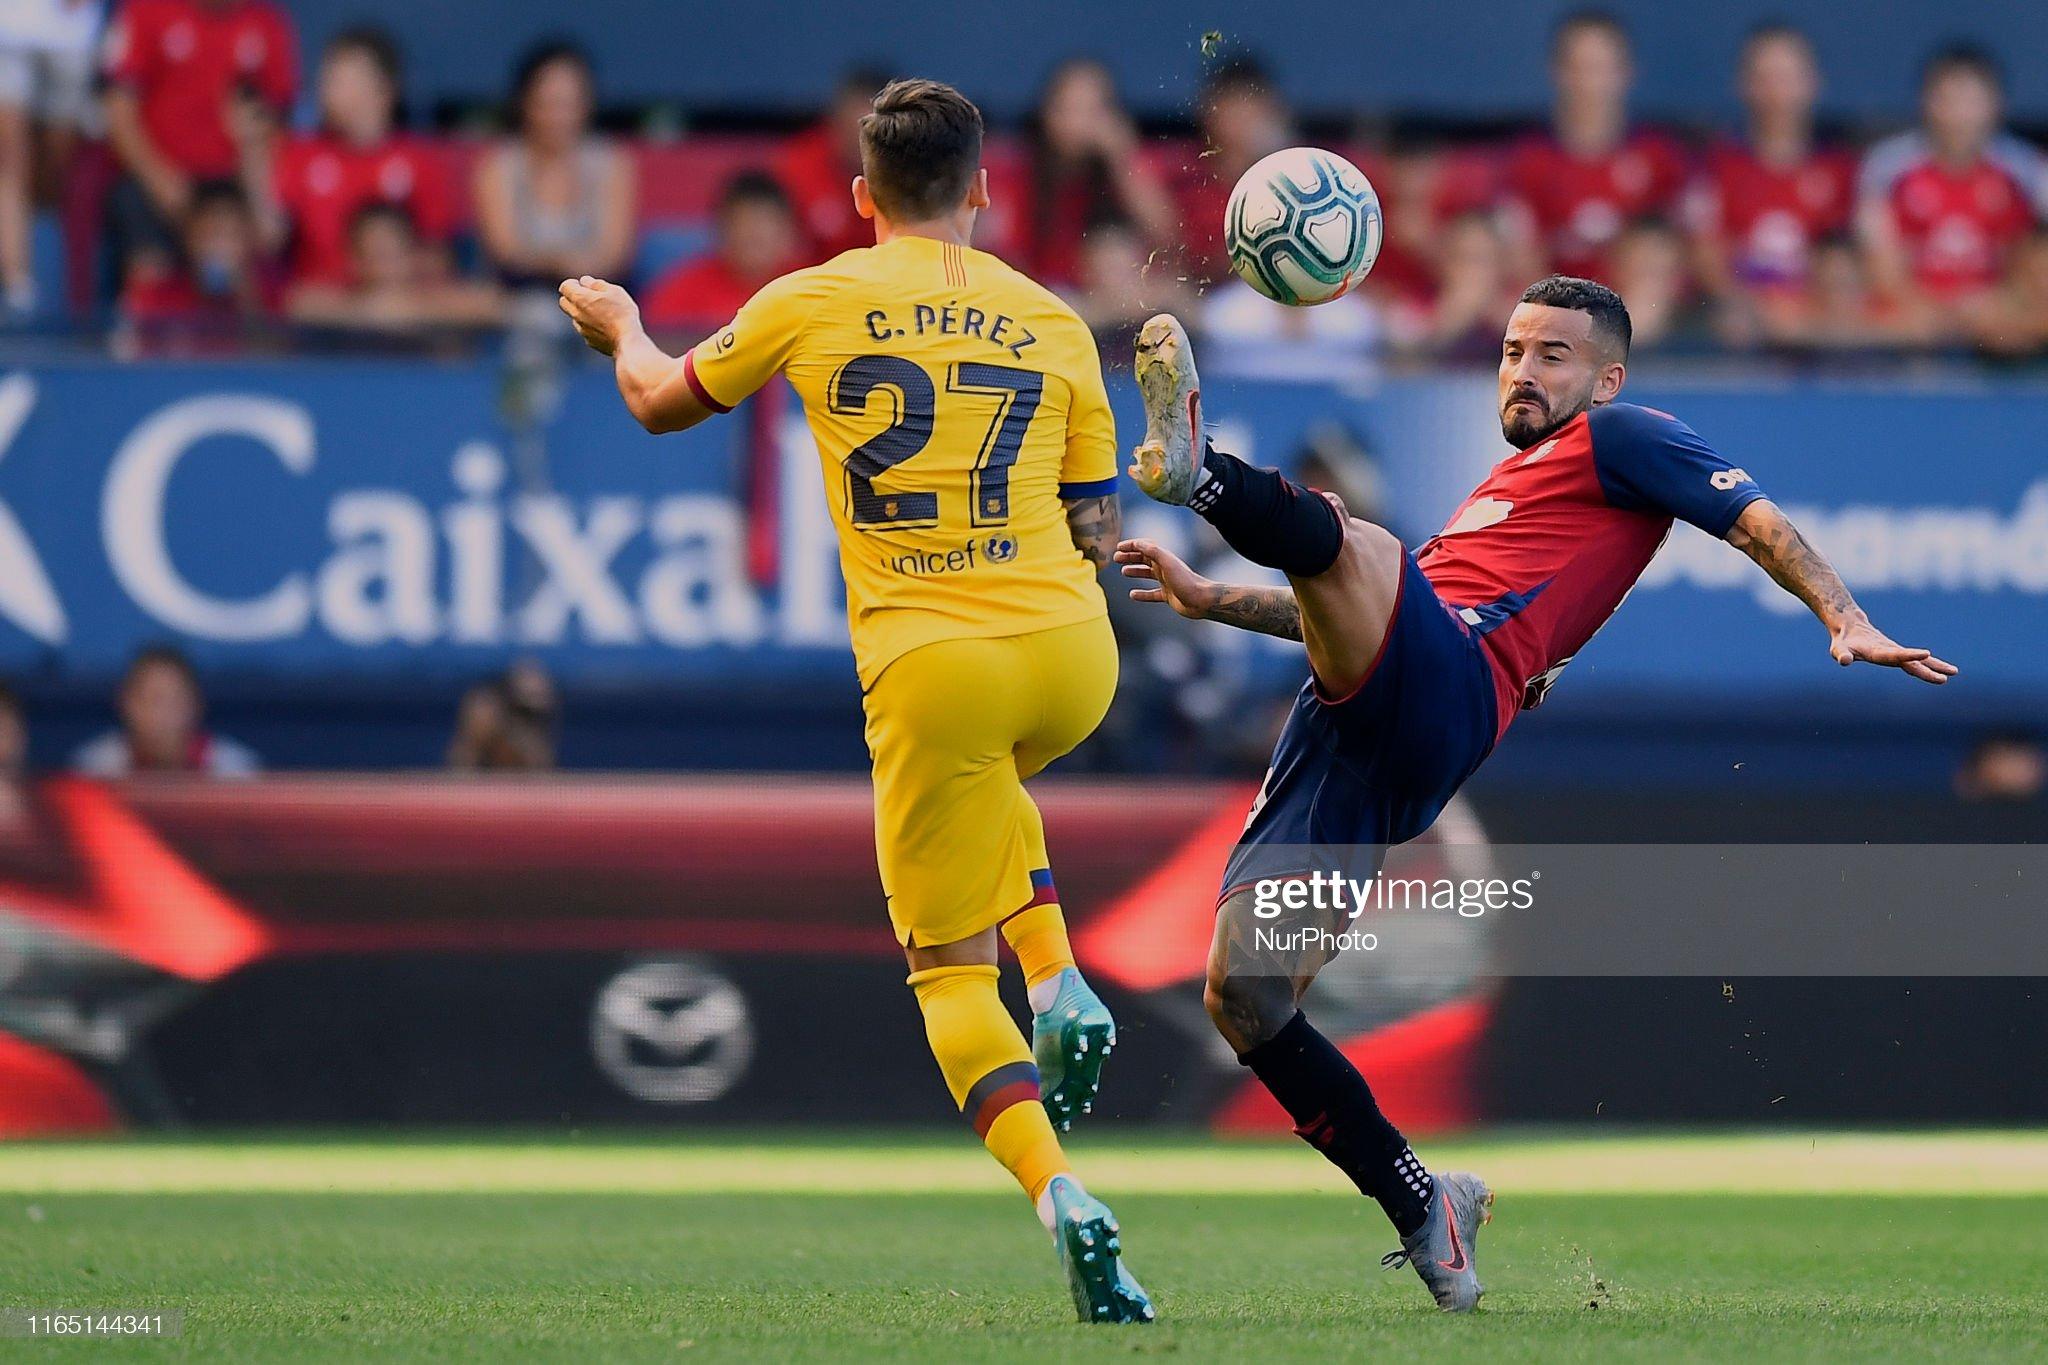 صور مباراة : أوساسونا - برشلونة 2-2 ( 31-08-2019 )  Ruben-garcia-of-osasuna-and-carles-perez-of-barcelona-competes-for-picture-id1165144341?s=2048x2048